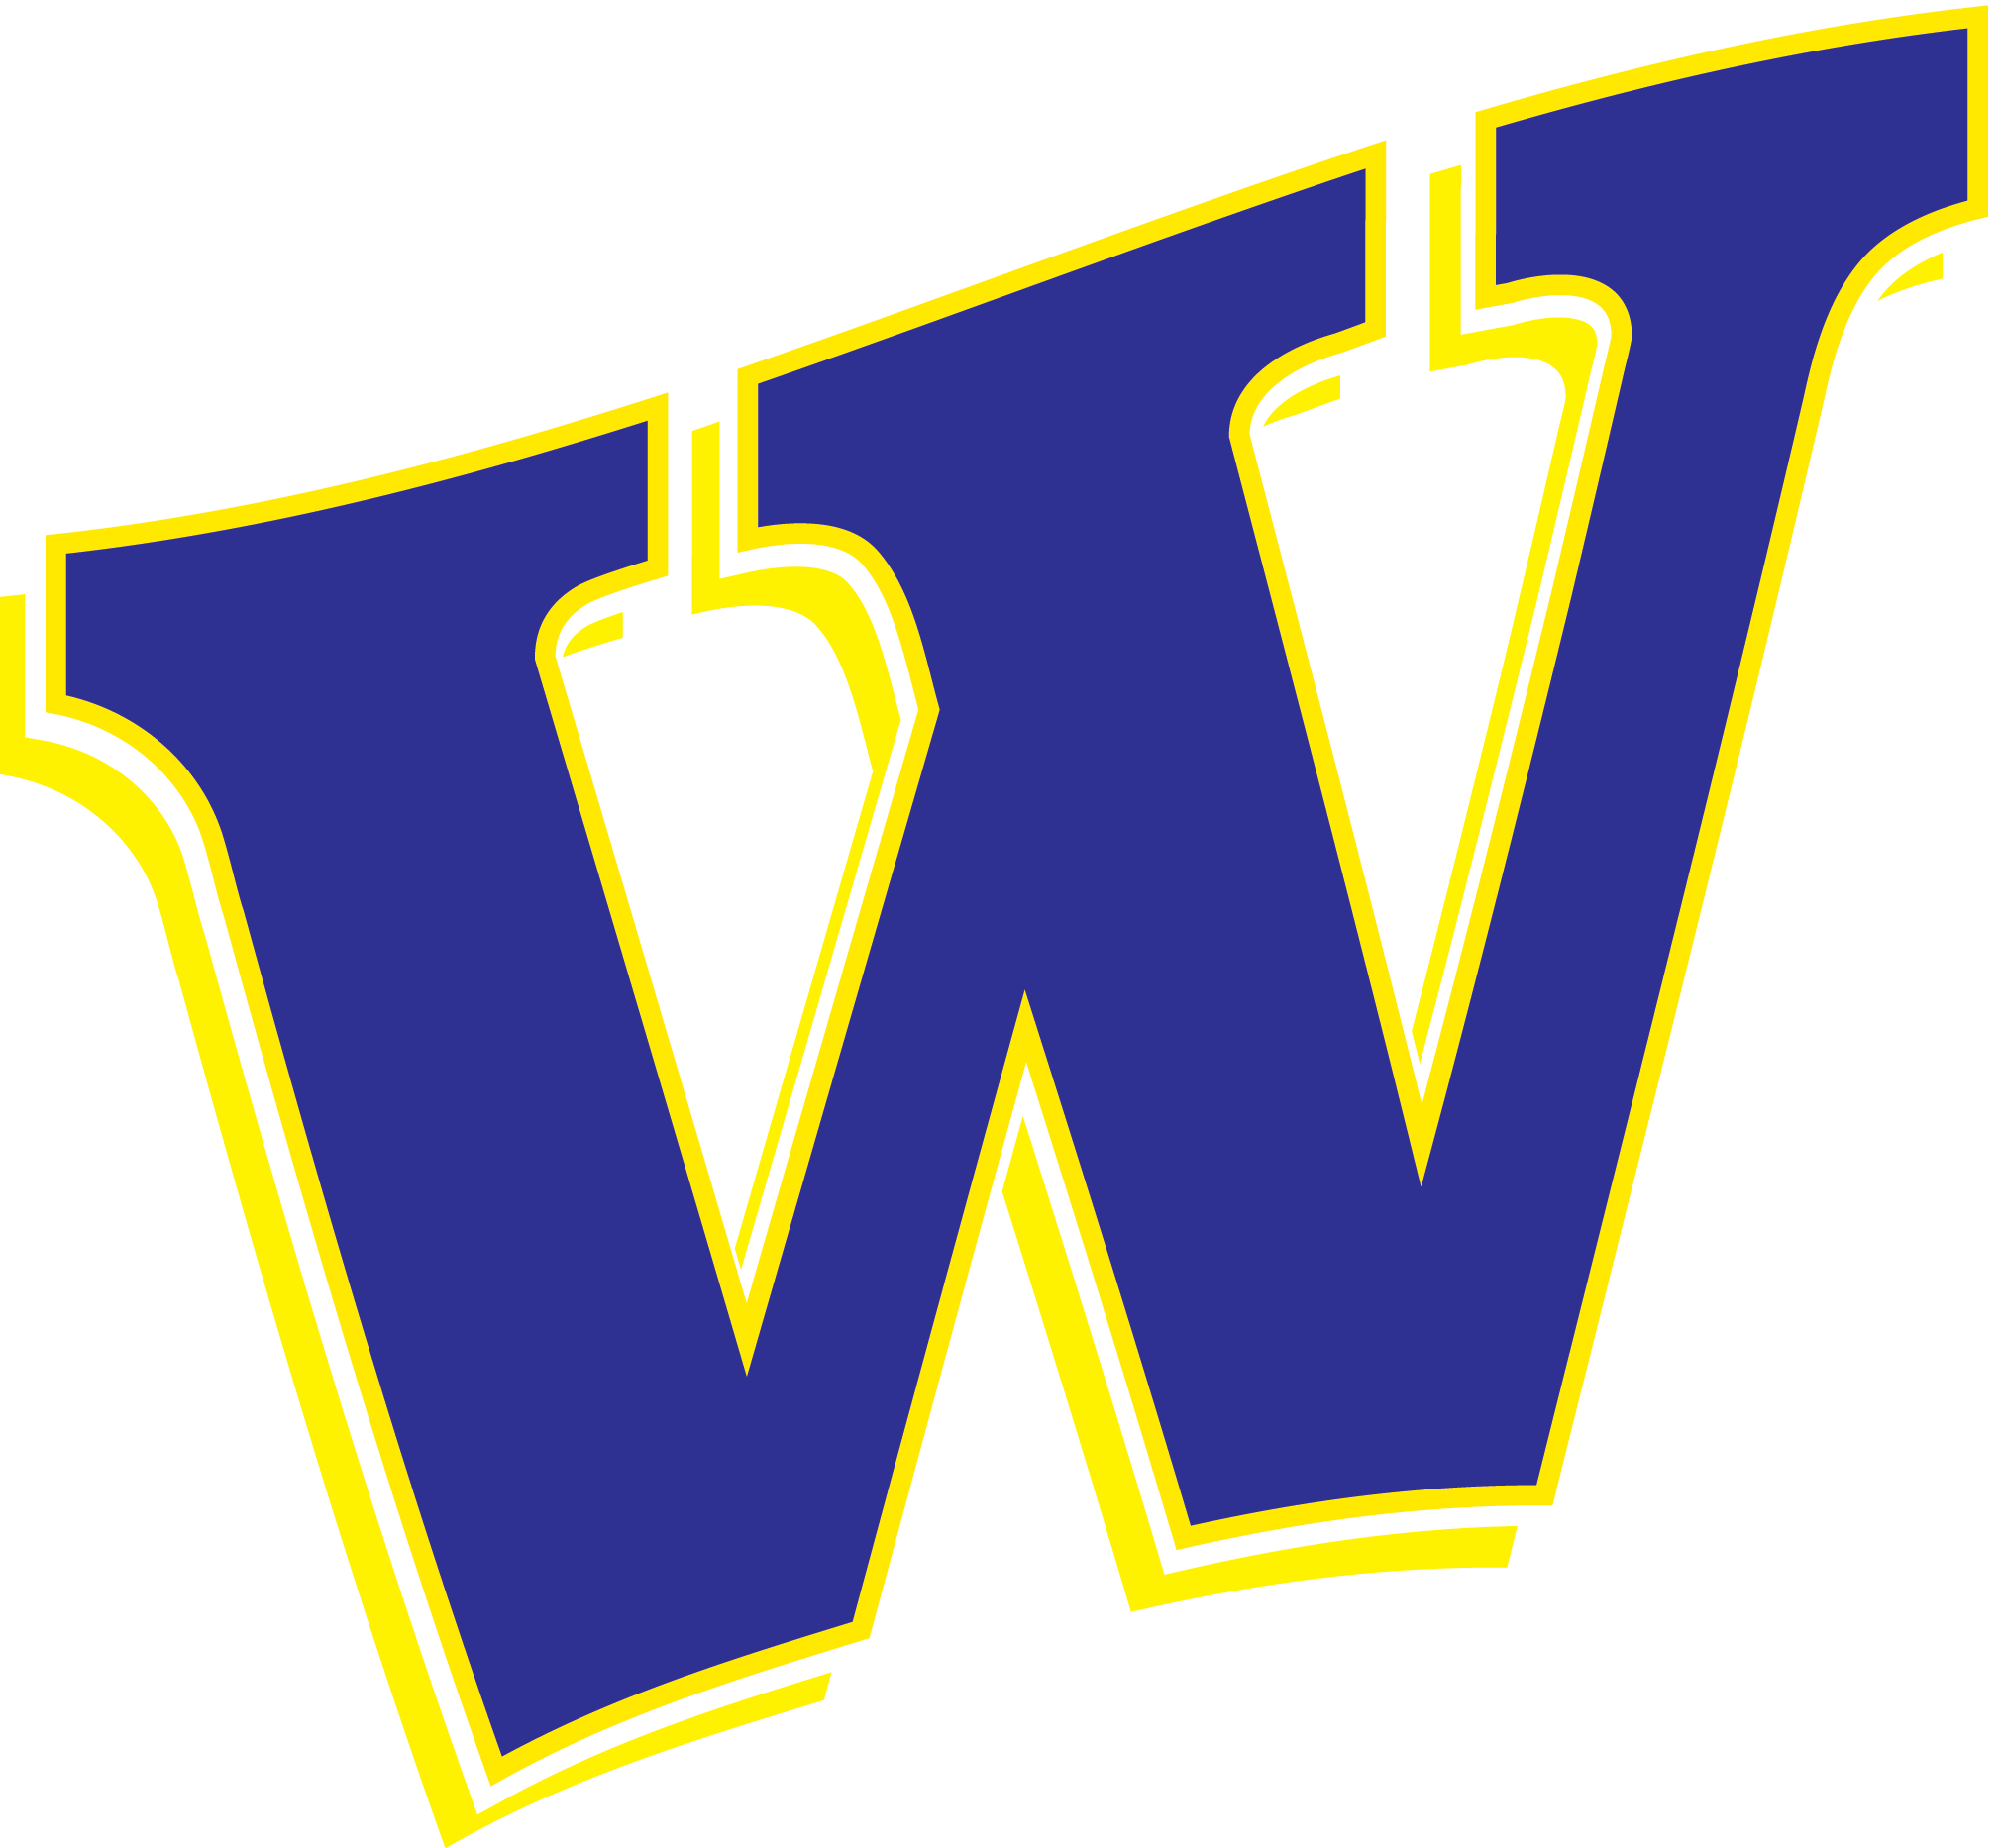 High school dance team clipart banner royalty free download West High School Athletics   West High School banner royalty free download